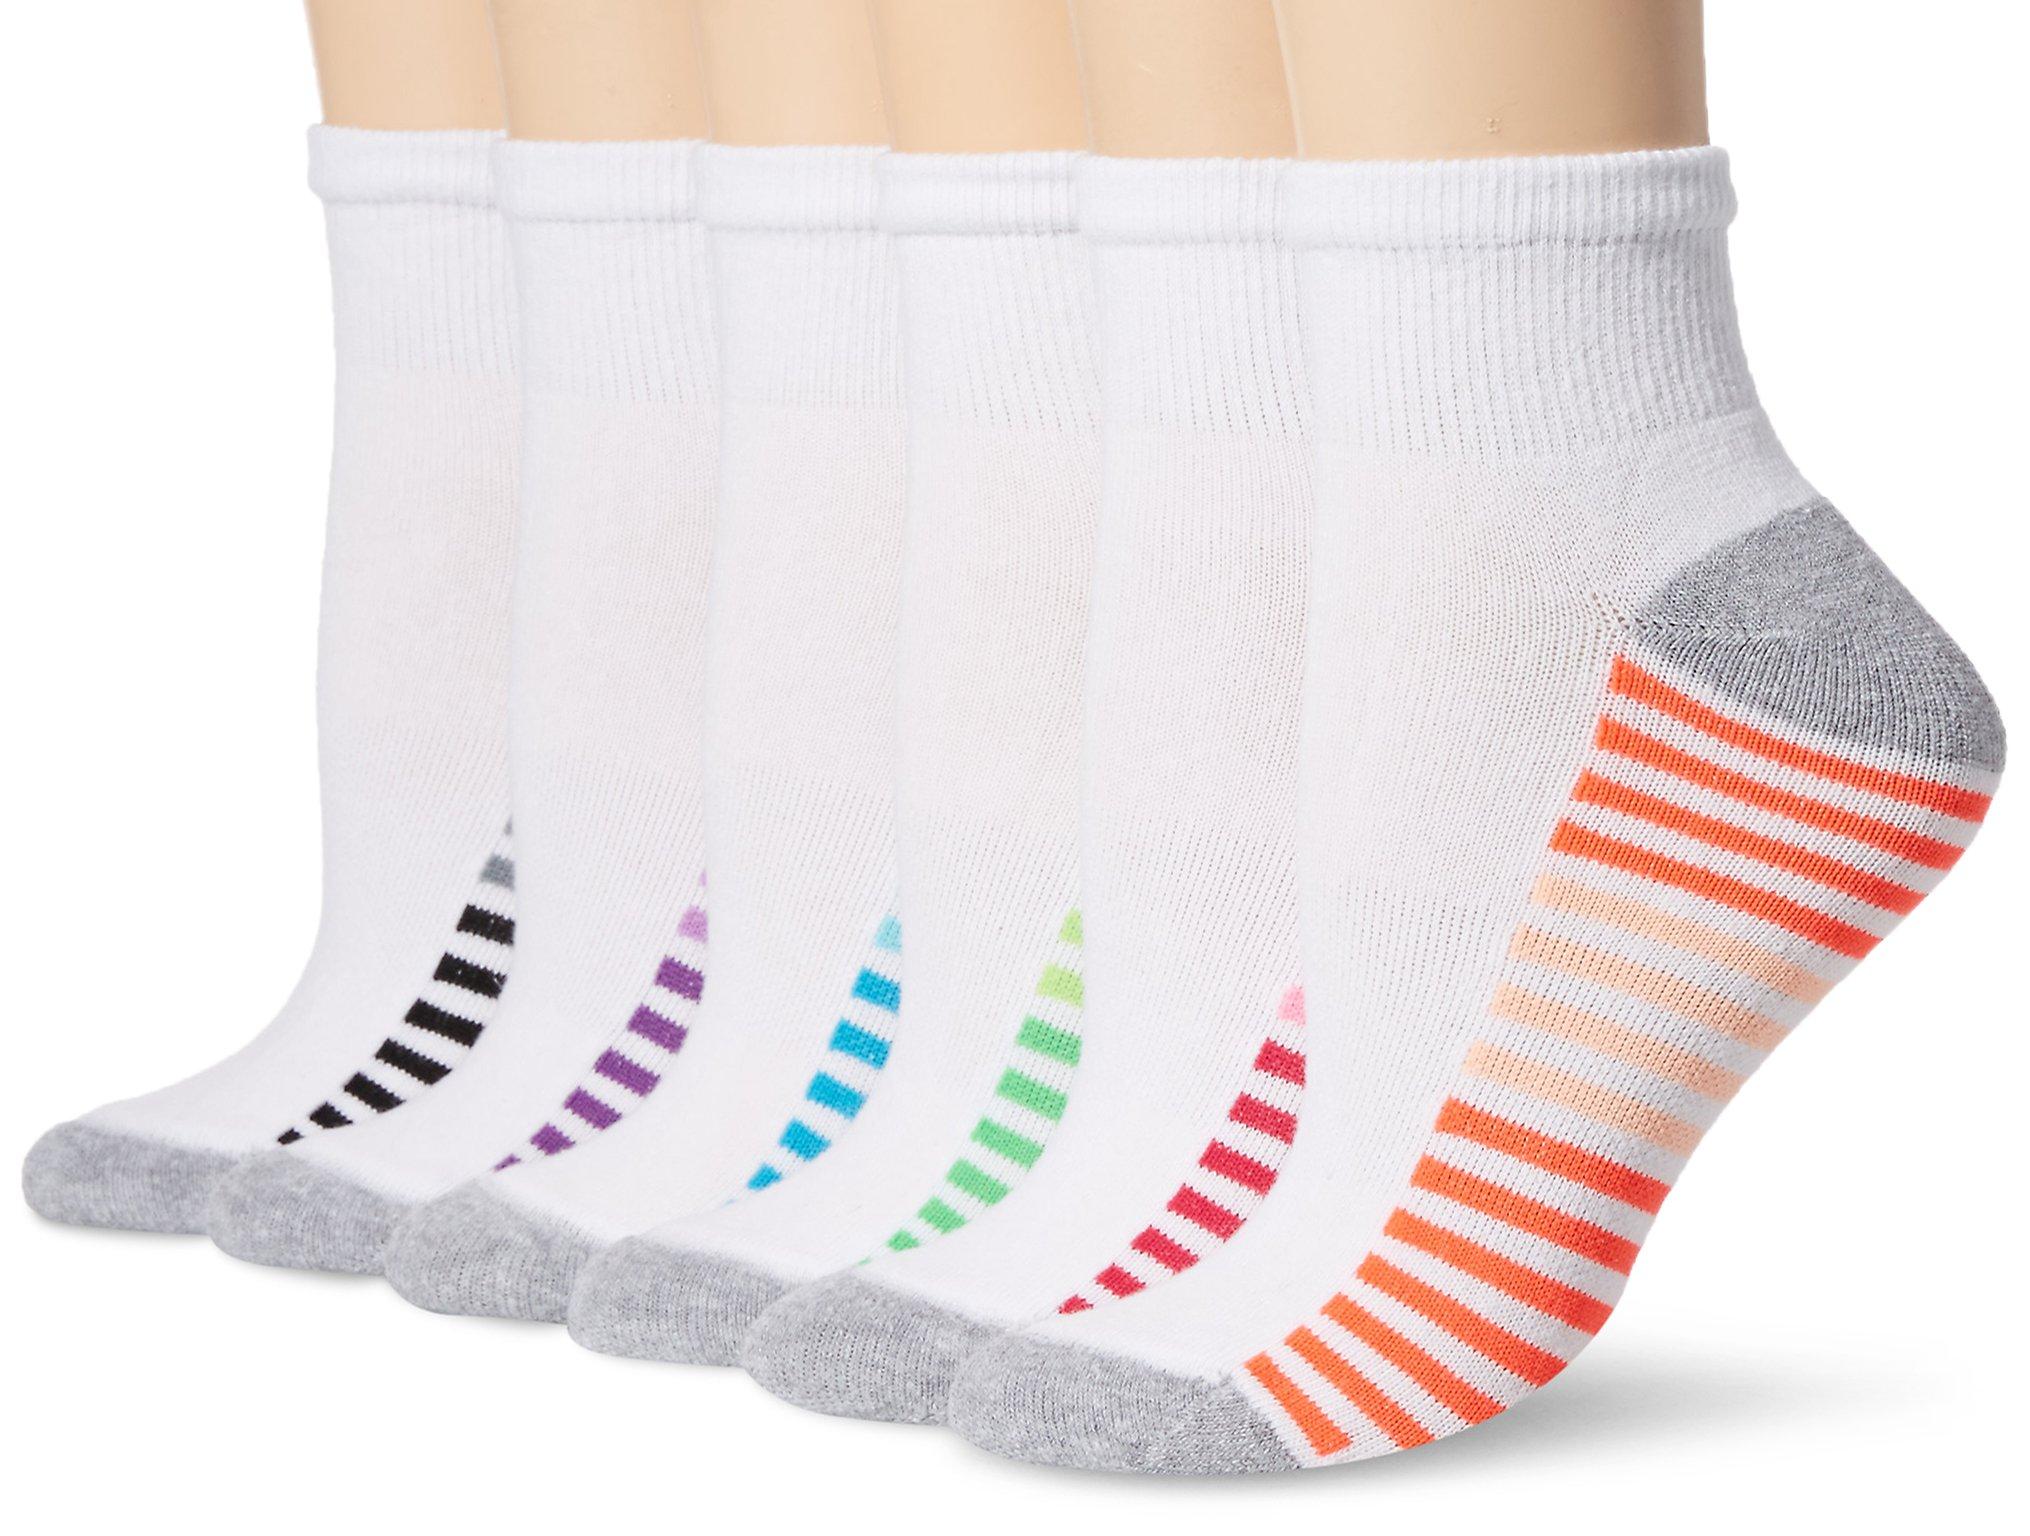 6c4bc0e1e62 Best Rated in Women s Socks   Hosiery   Helpful Customer Reviews ...